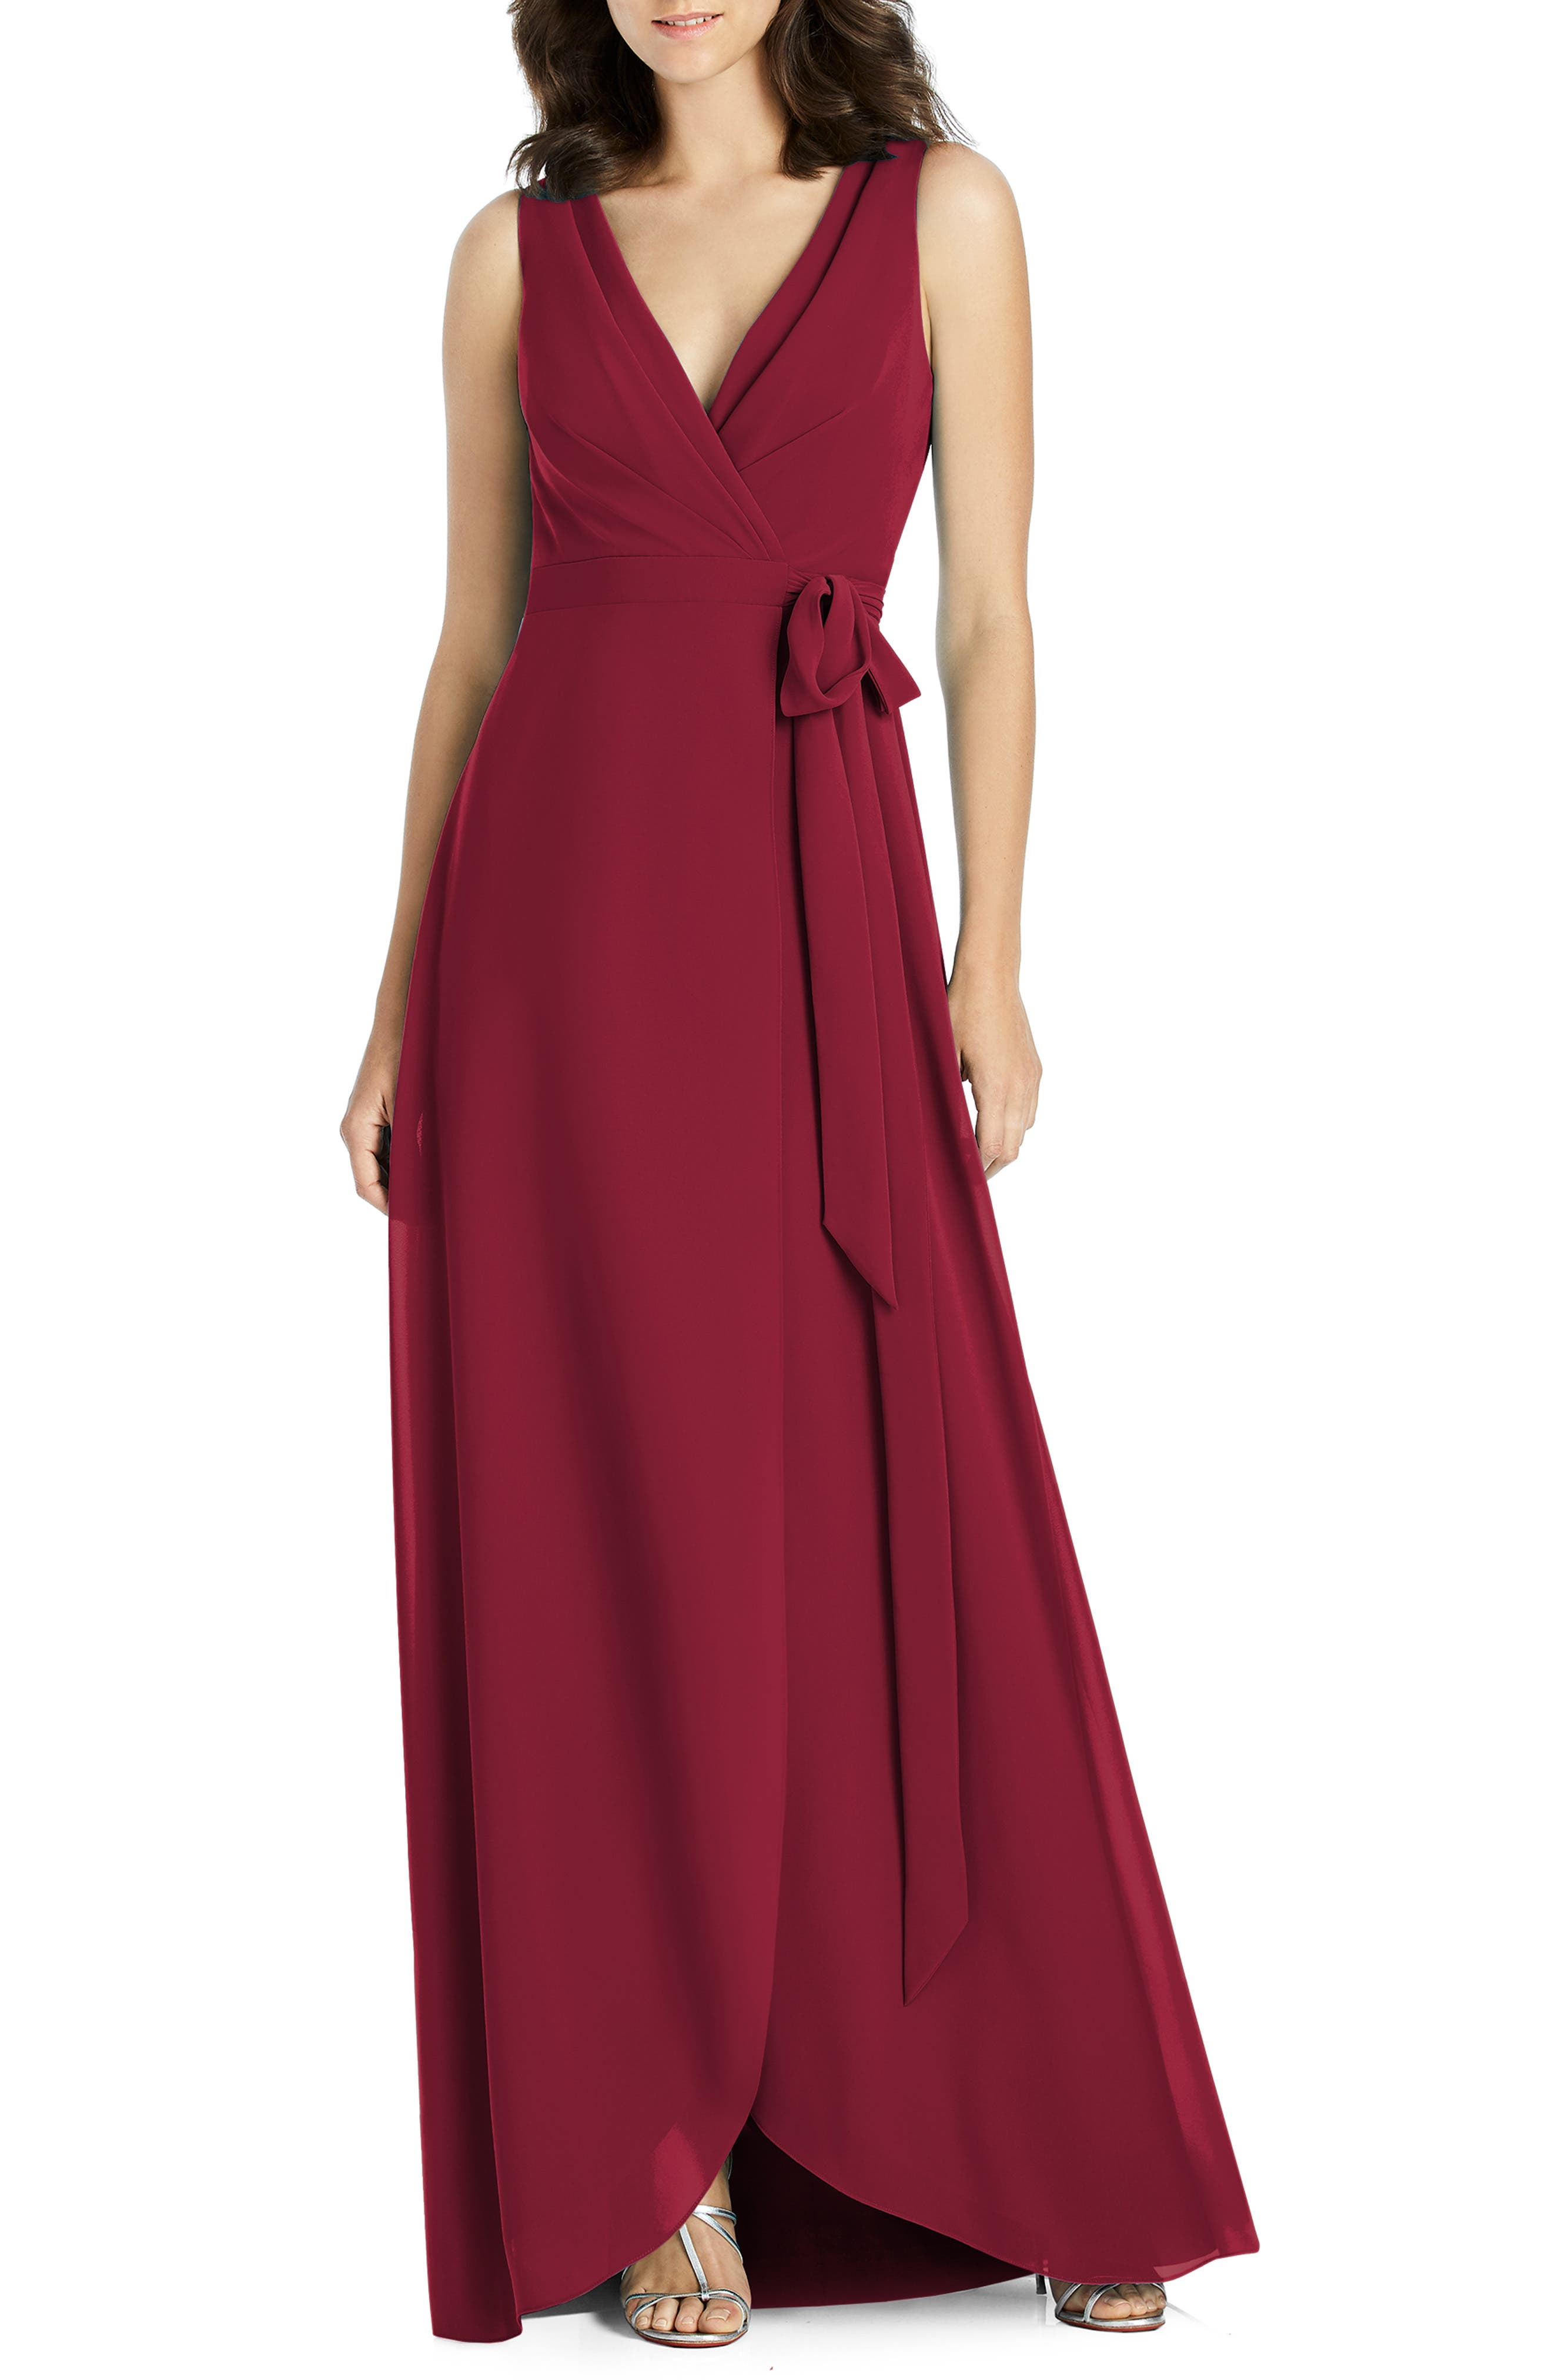 Jenny Packham Chiffon Wrap Evening Dress, Burgundy